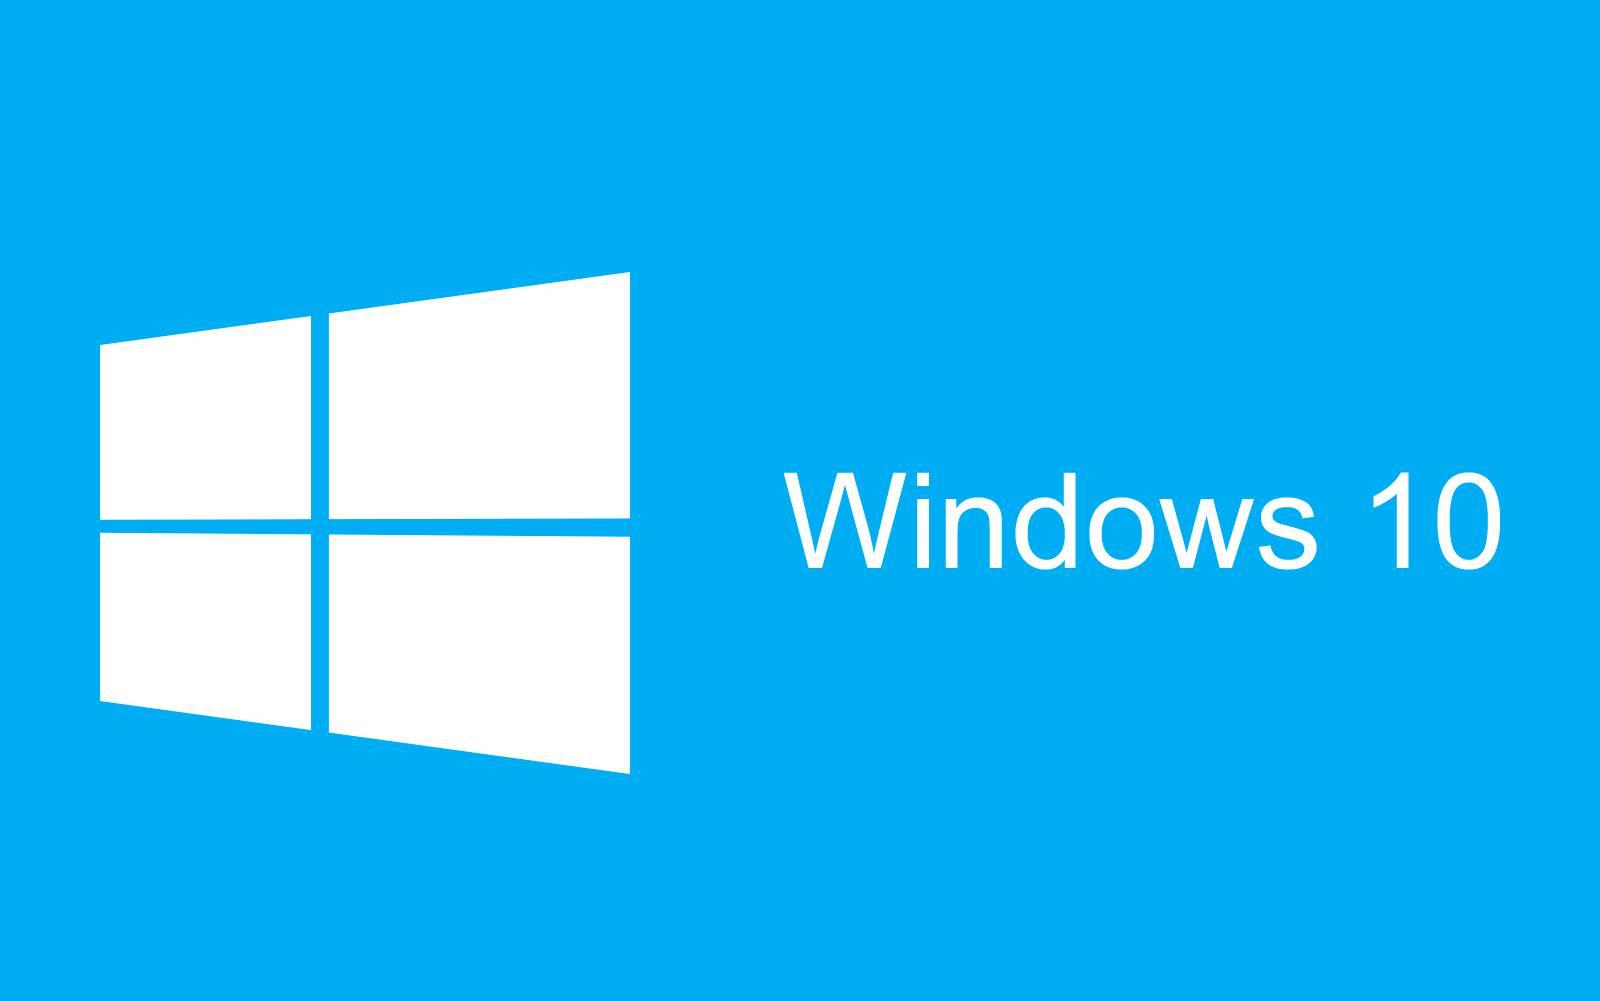 Windows 10 cumulativ